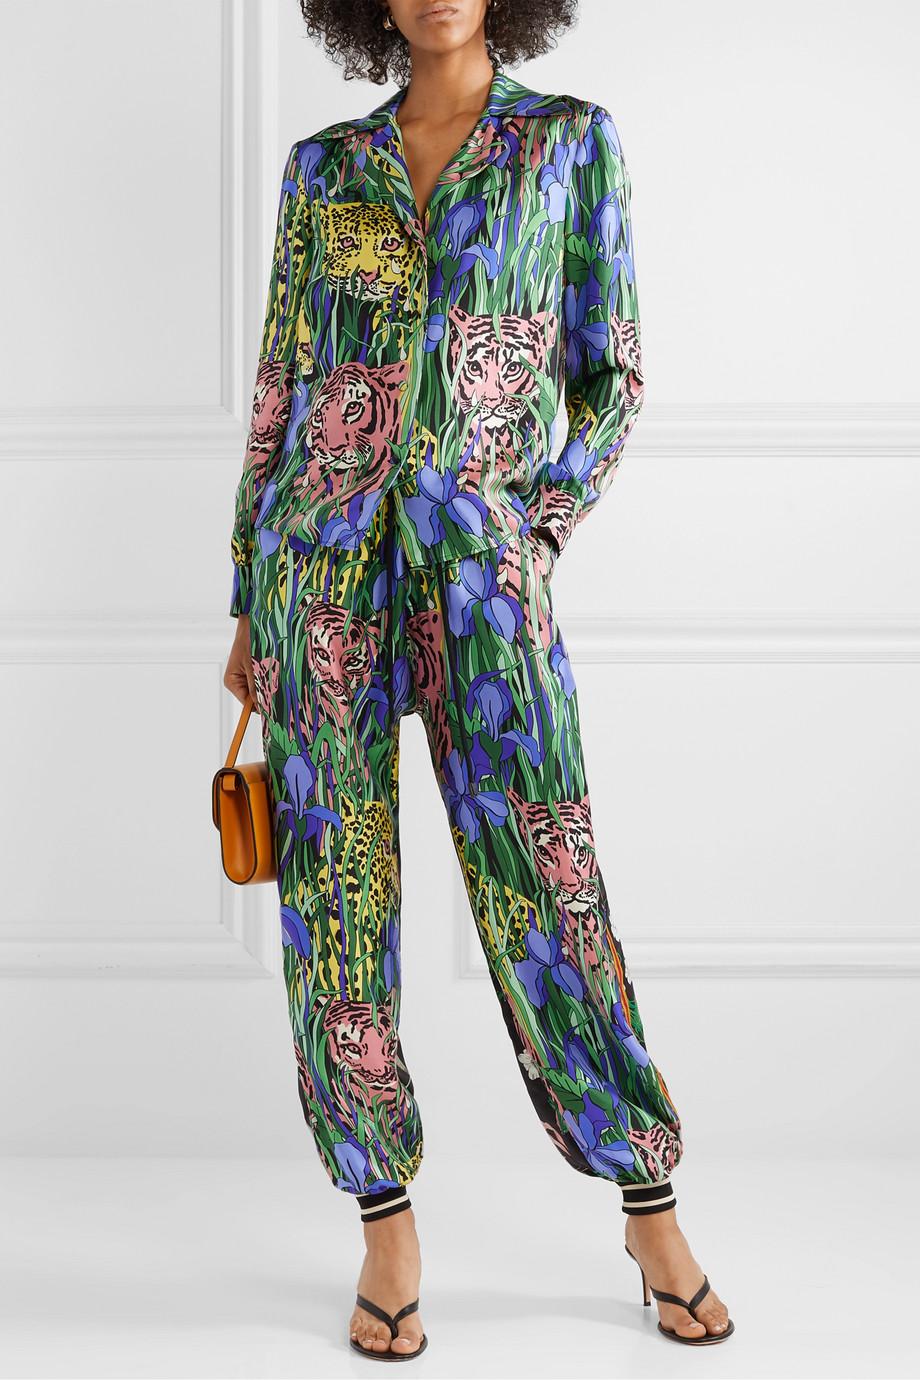 Gucci Bedrucktes Hemd aus Seiden-Twill